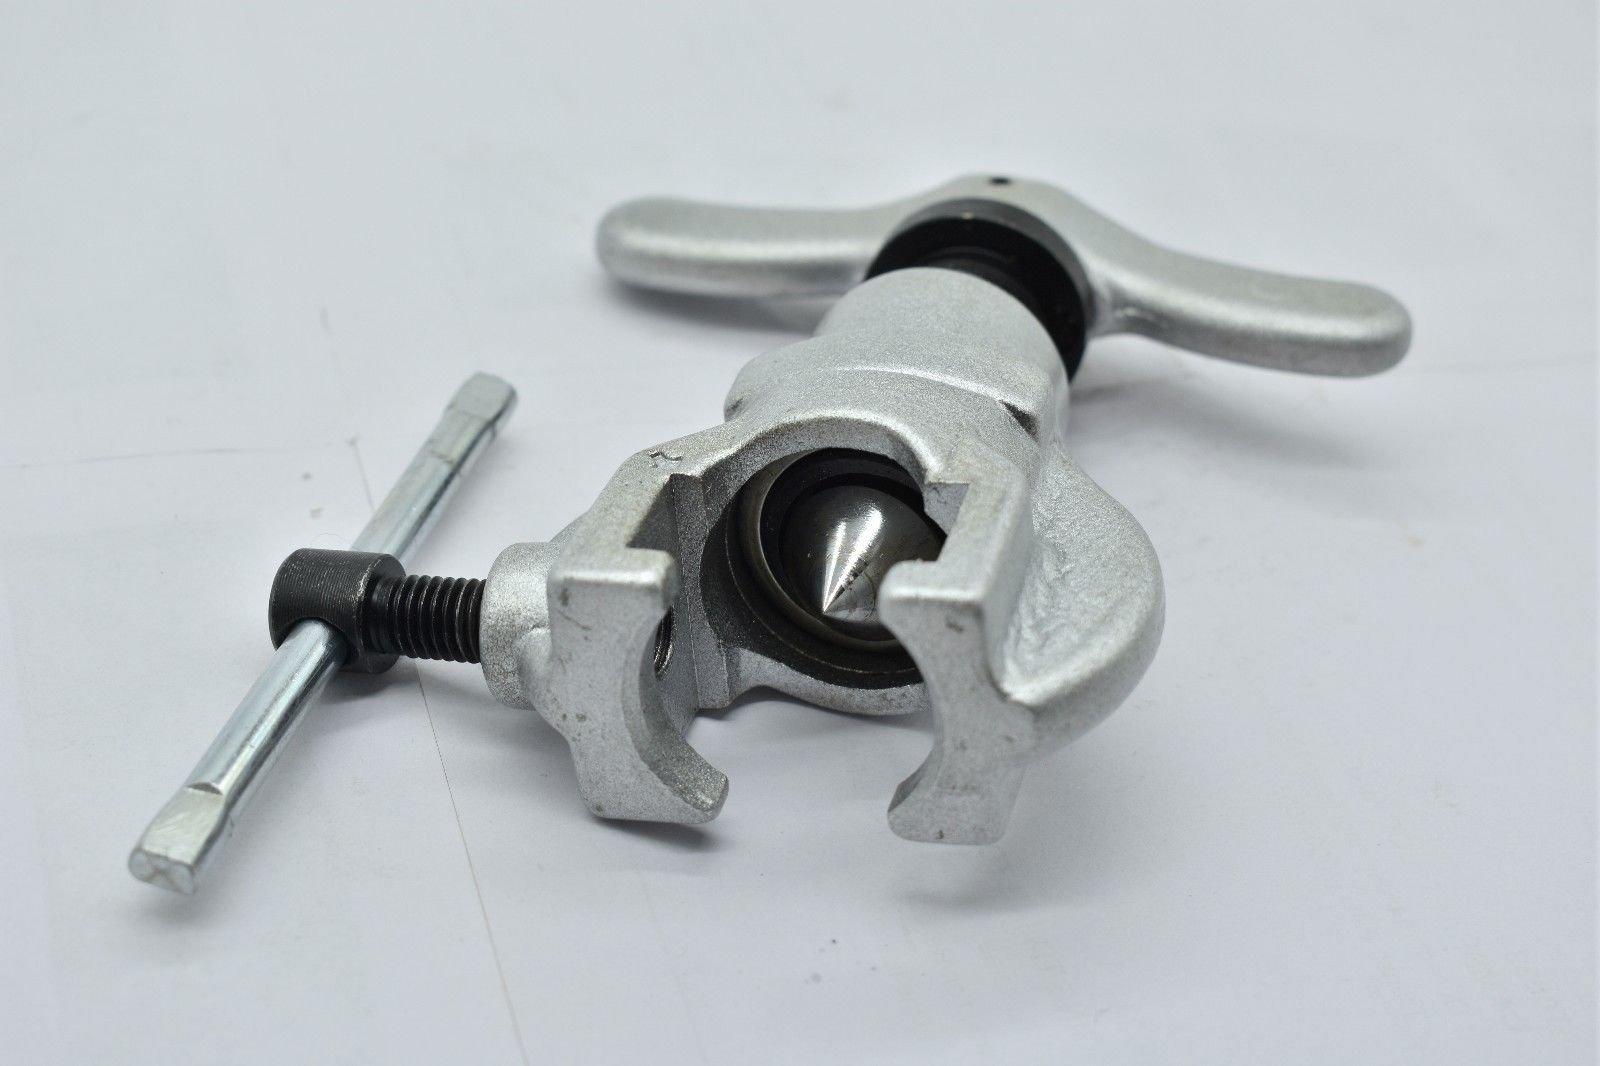 JINDITAI 37 Degree Non Ratchet Eccentric Pipe Flaring Tools SAE 3/16''-3/4'' by JINDITAI (Image #4)